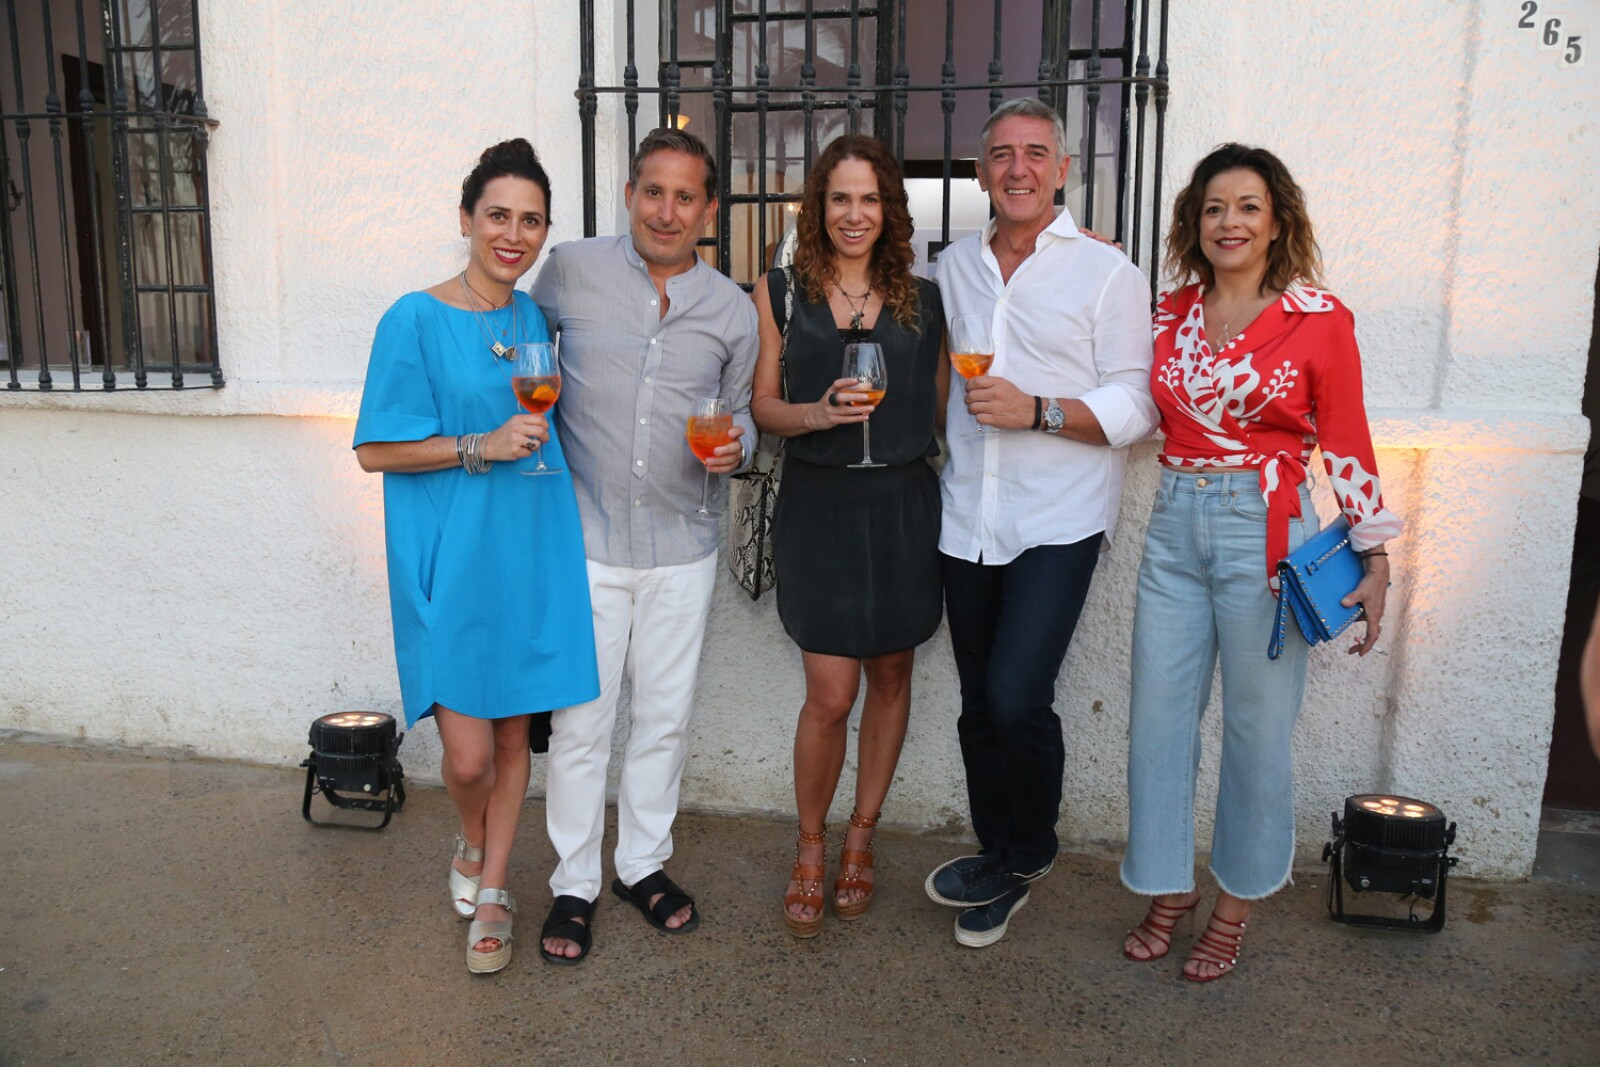 Daniela Roel, Moises Micha, Virna Winckelmann, Alejandro Bolin, Fanny Carrillo.jpg